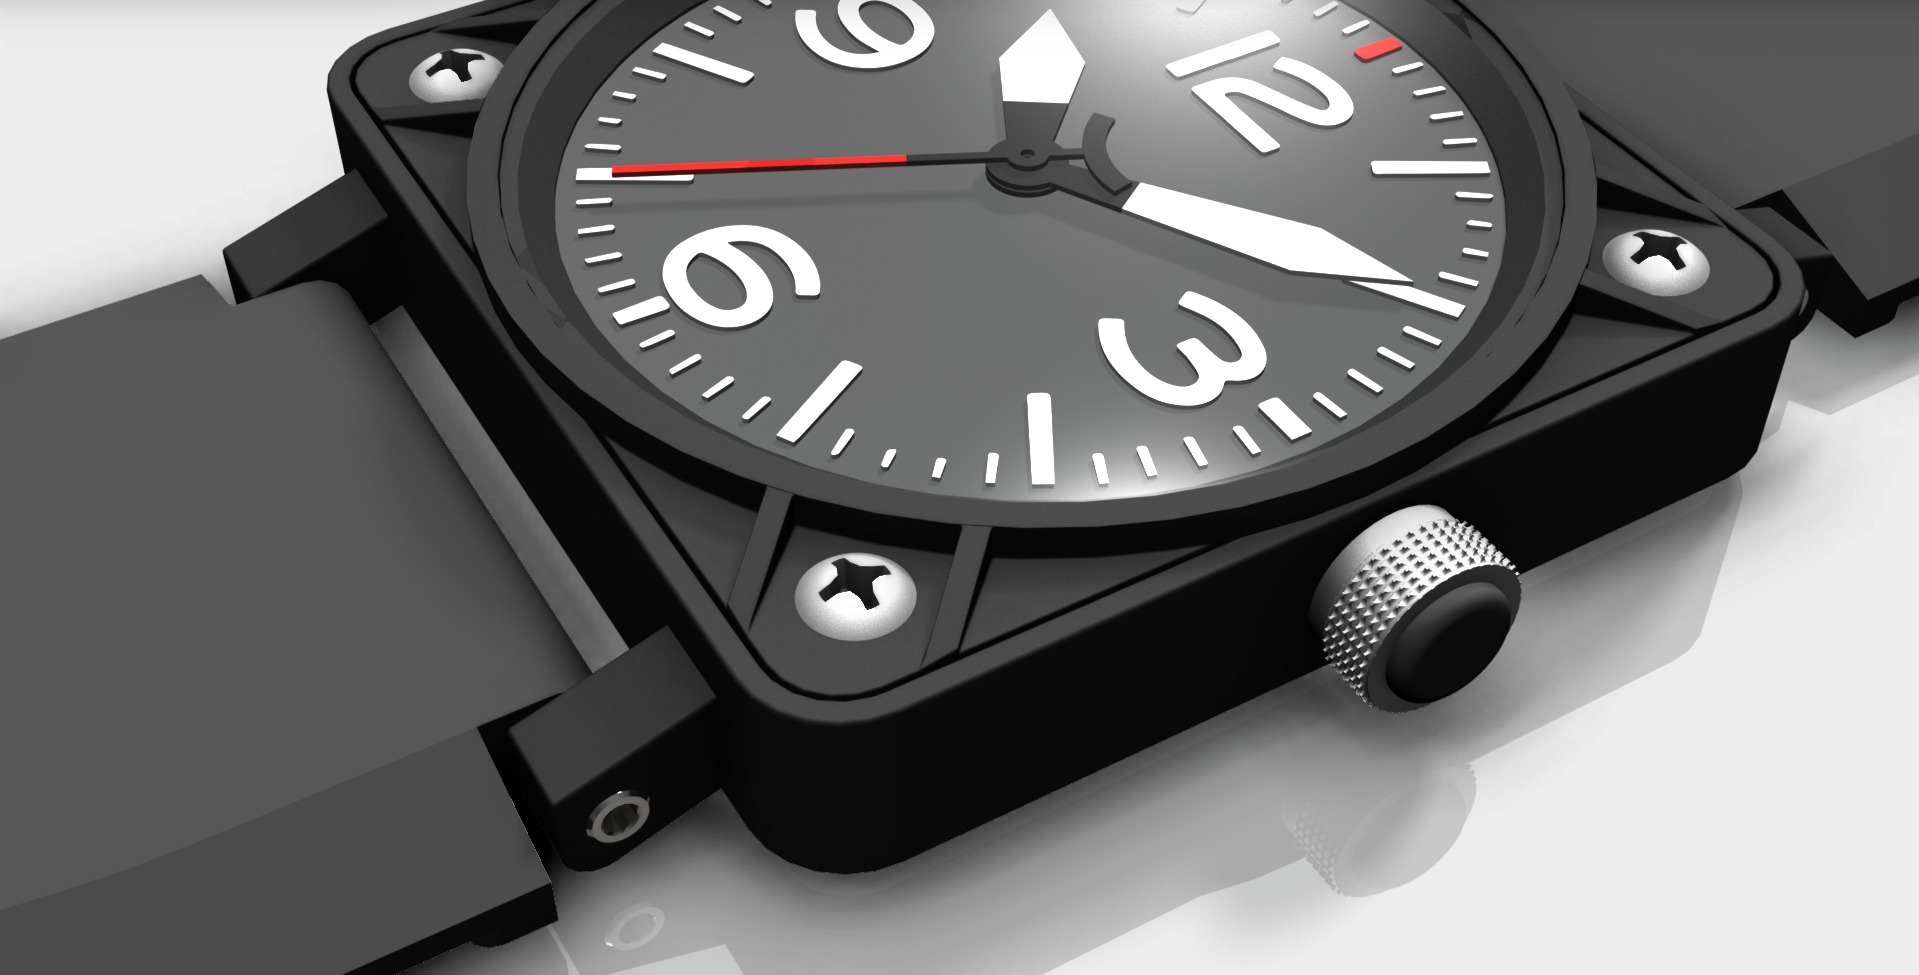 Replica_watch_v1_closeup